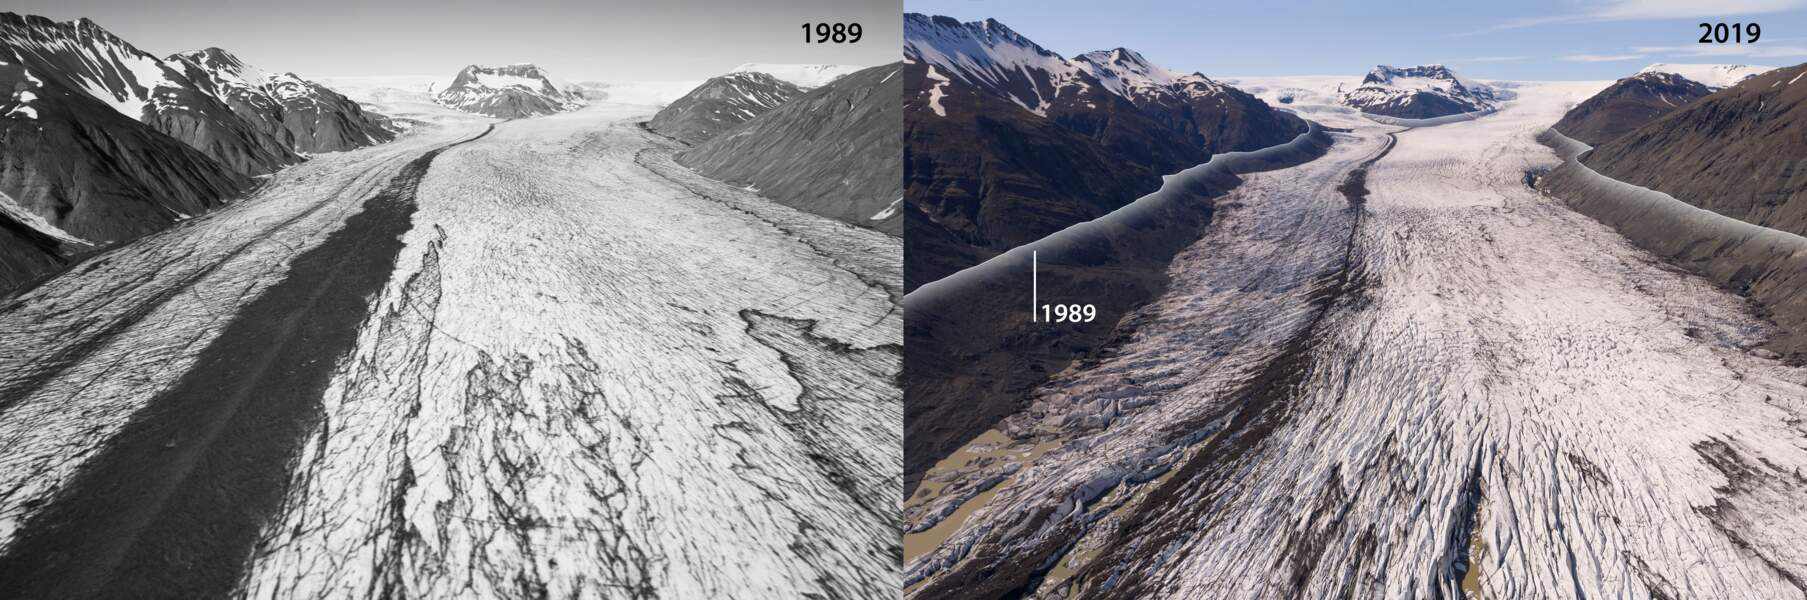 Le glacier Heinabergsjökull en 1989 et en 2019